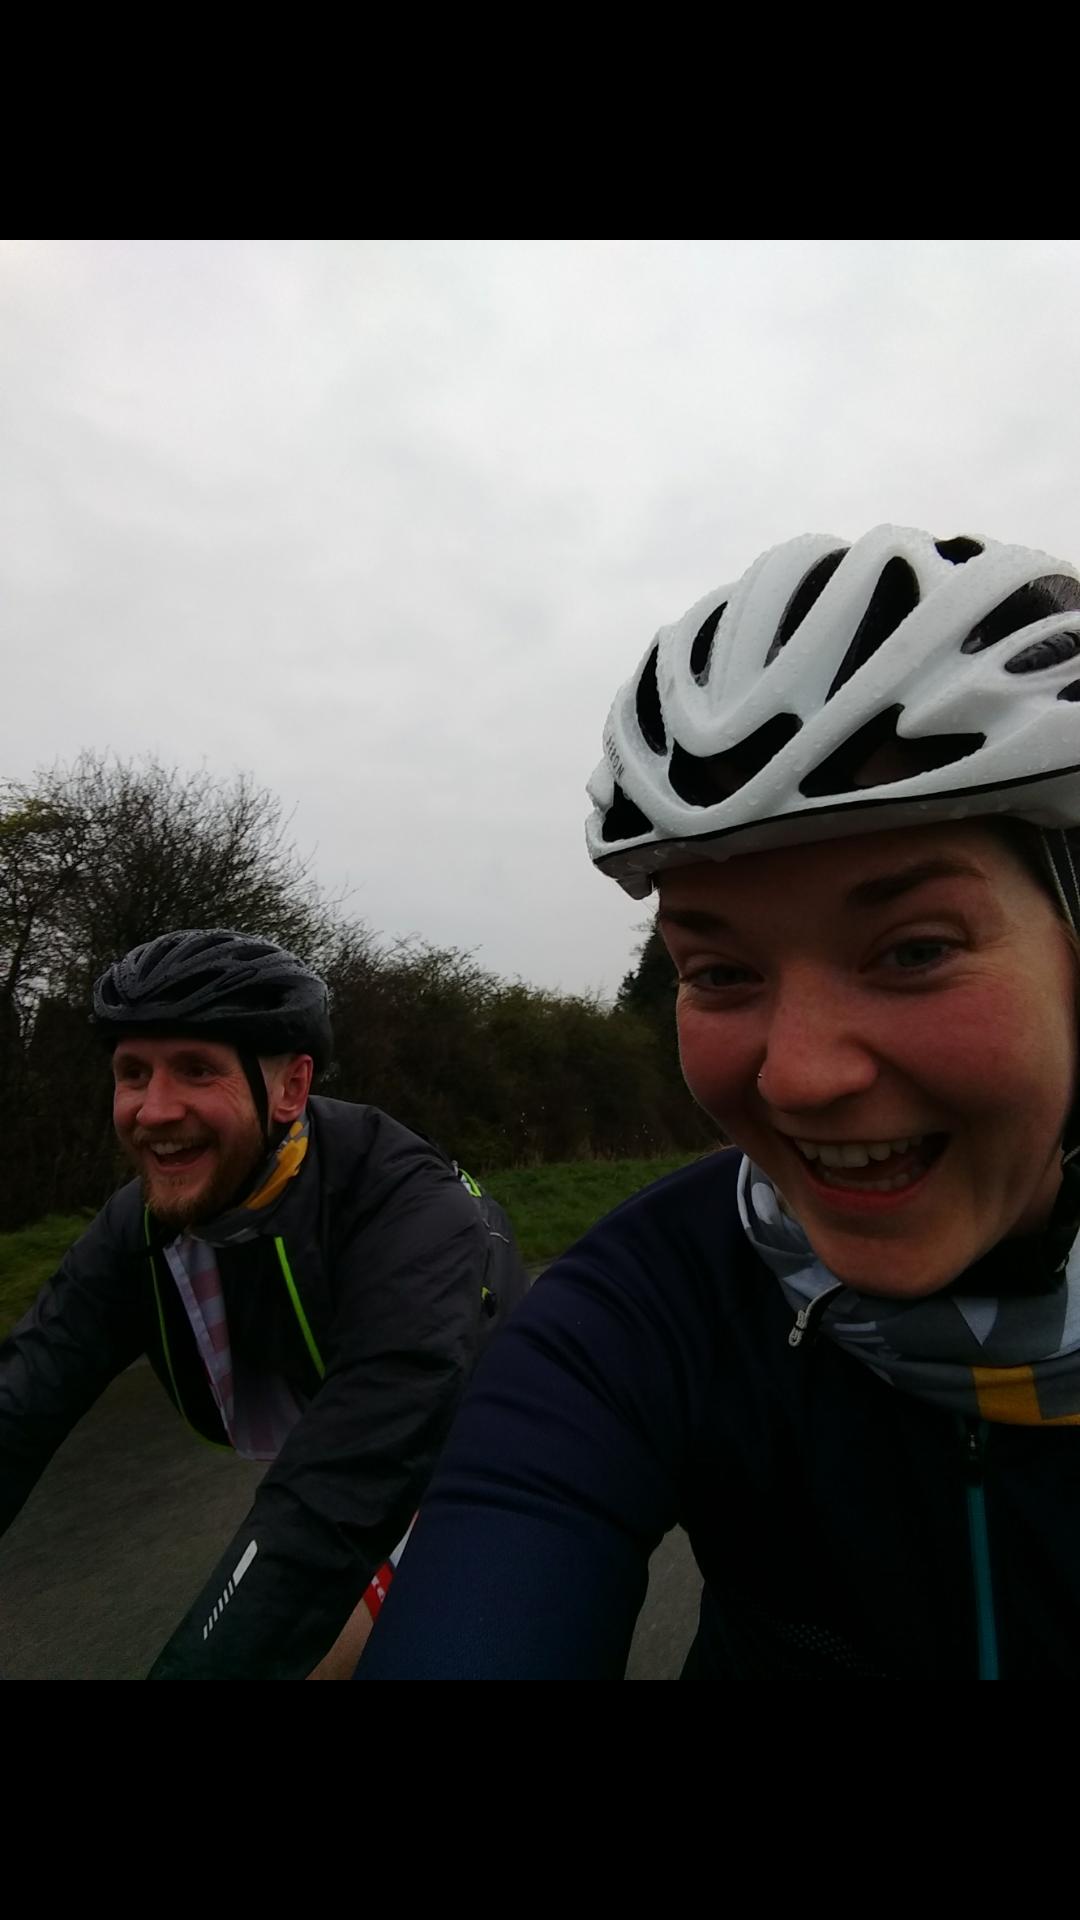 Love at first bike